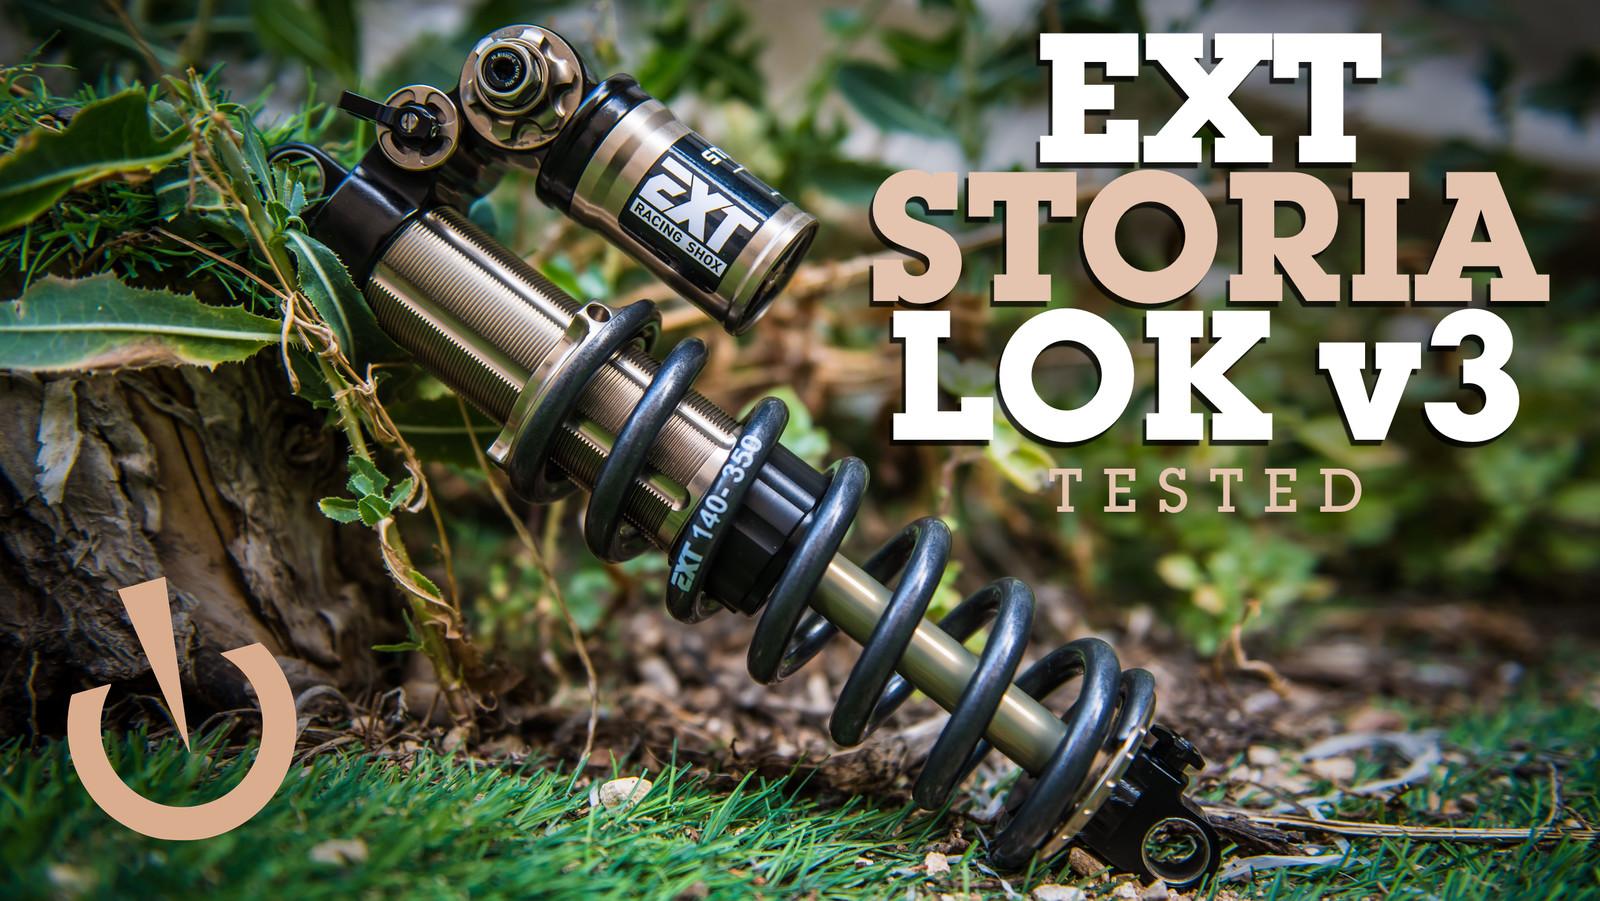 Italian Suspension for Your Enduro Bike: EXT Storia Lok v3 Reviewed